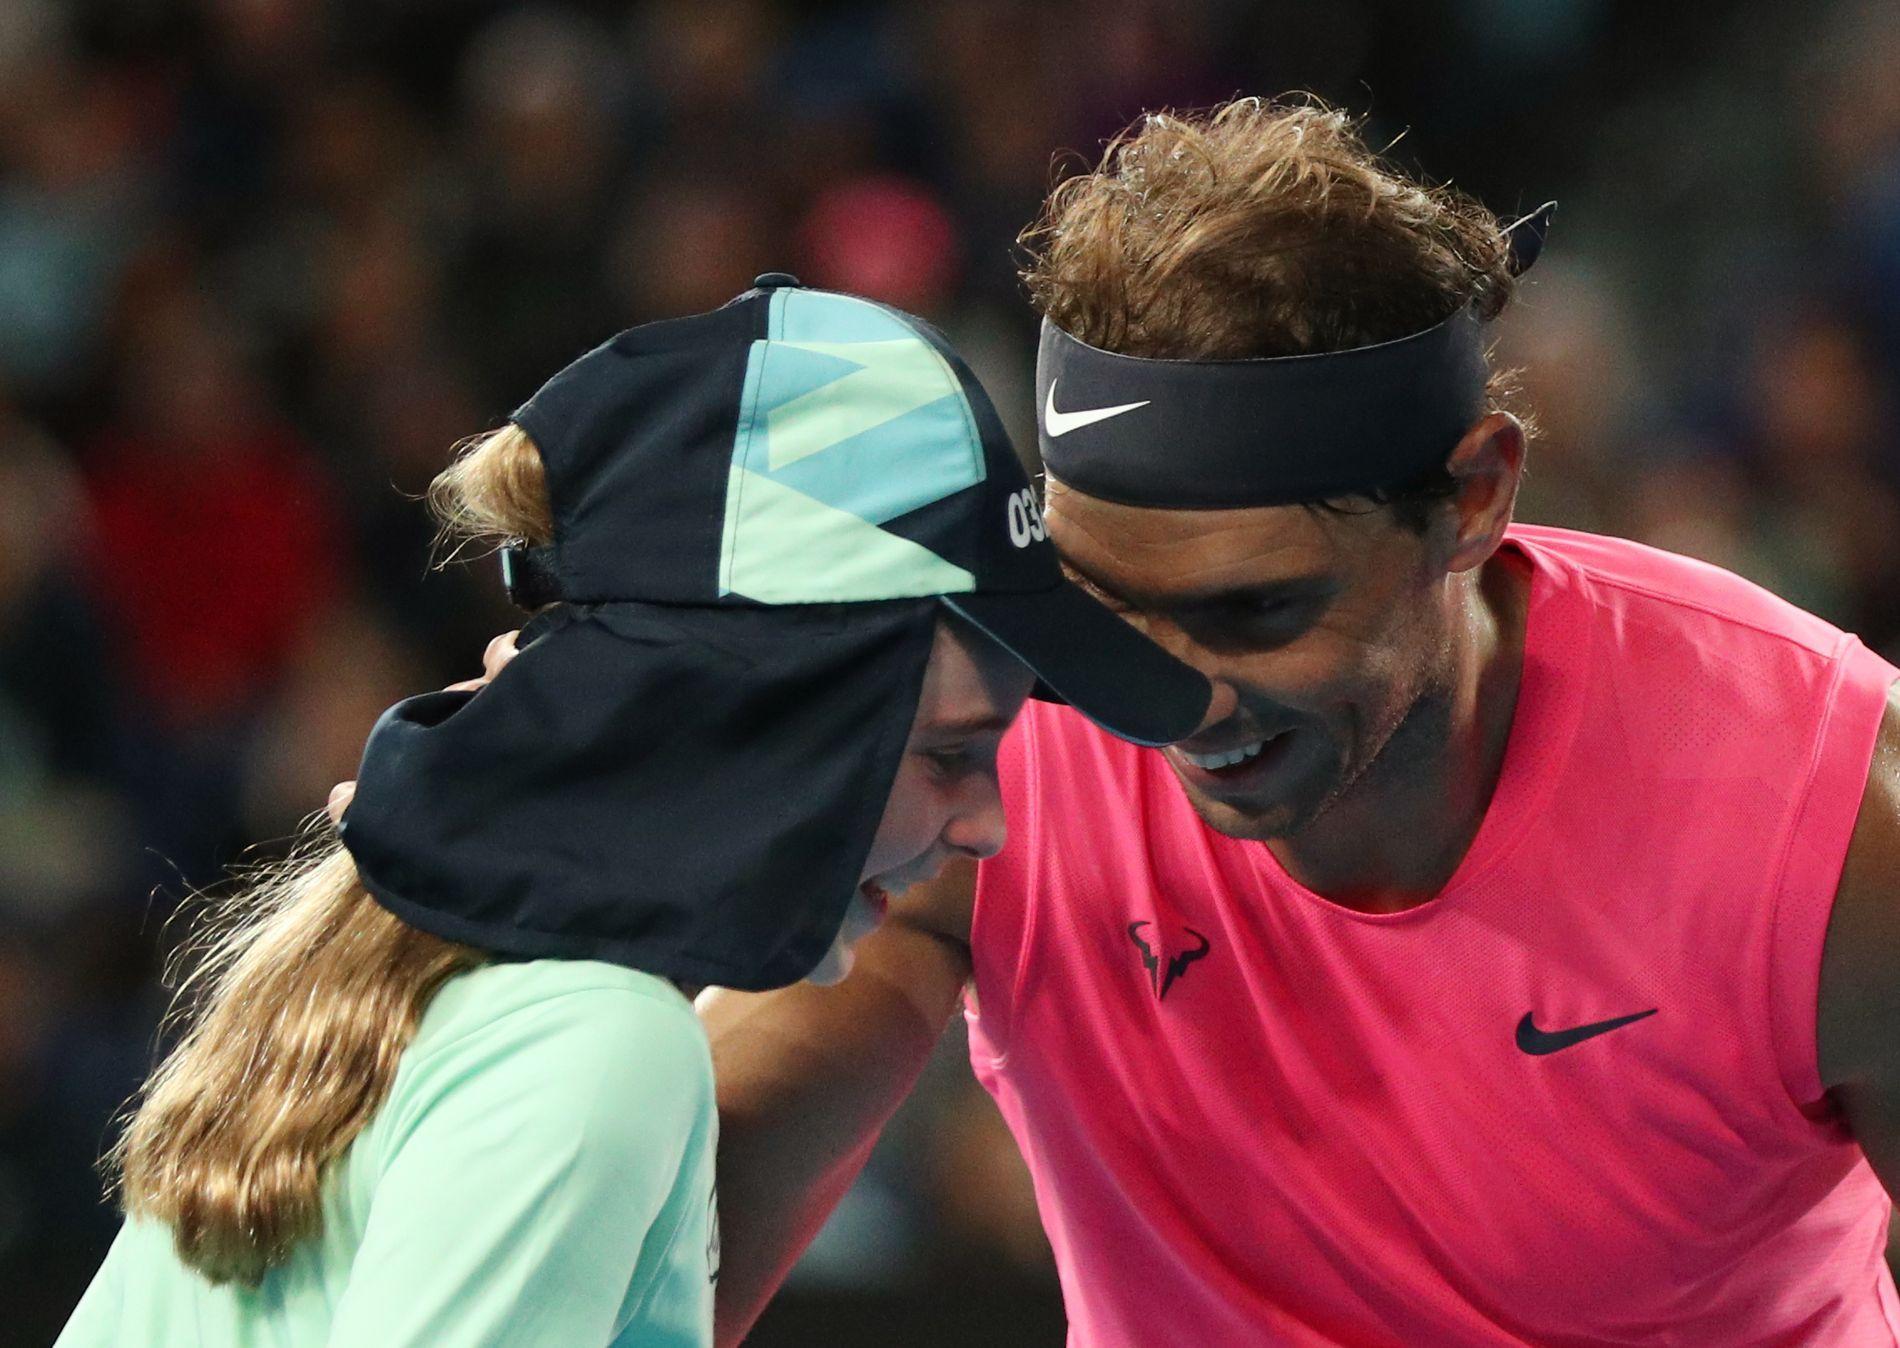 Nadal v Melbourne trefil holčičku do hlavy. Omluvil se polibkem a čelenkou